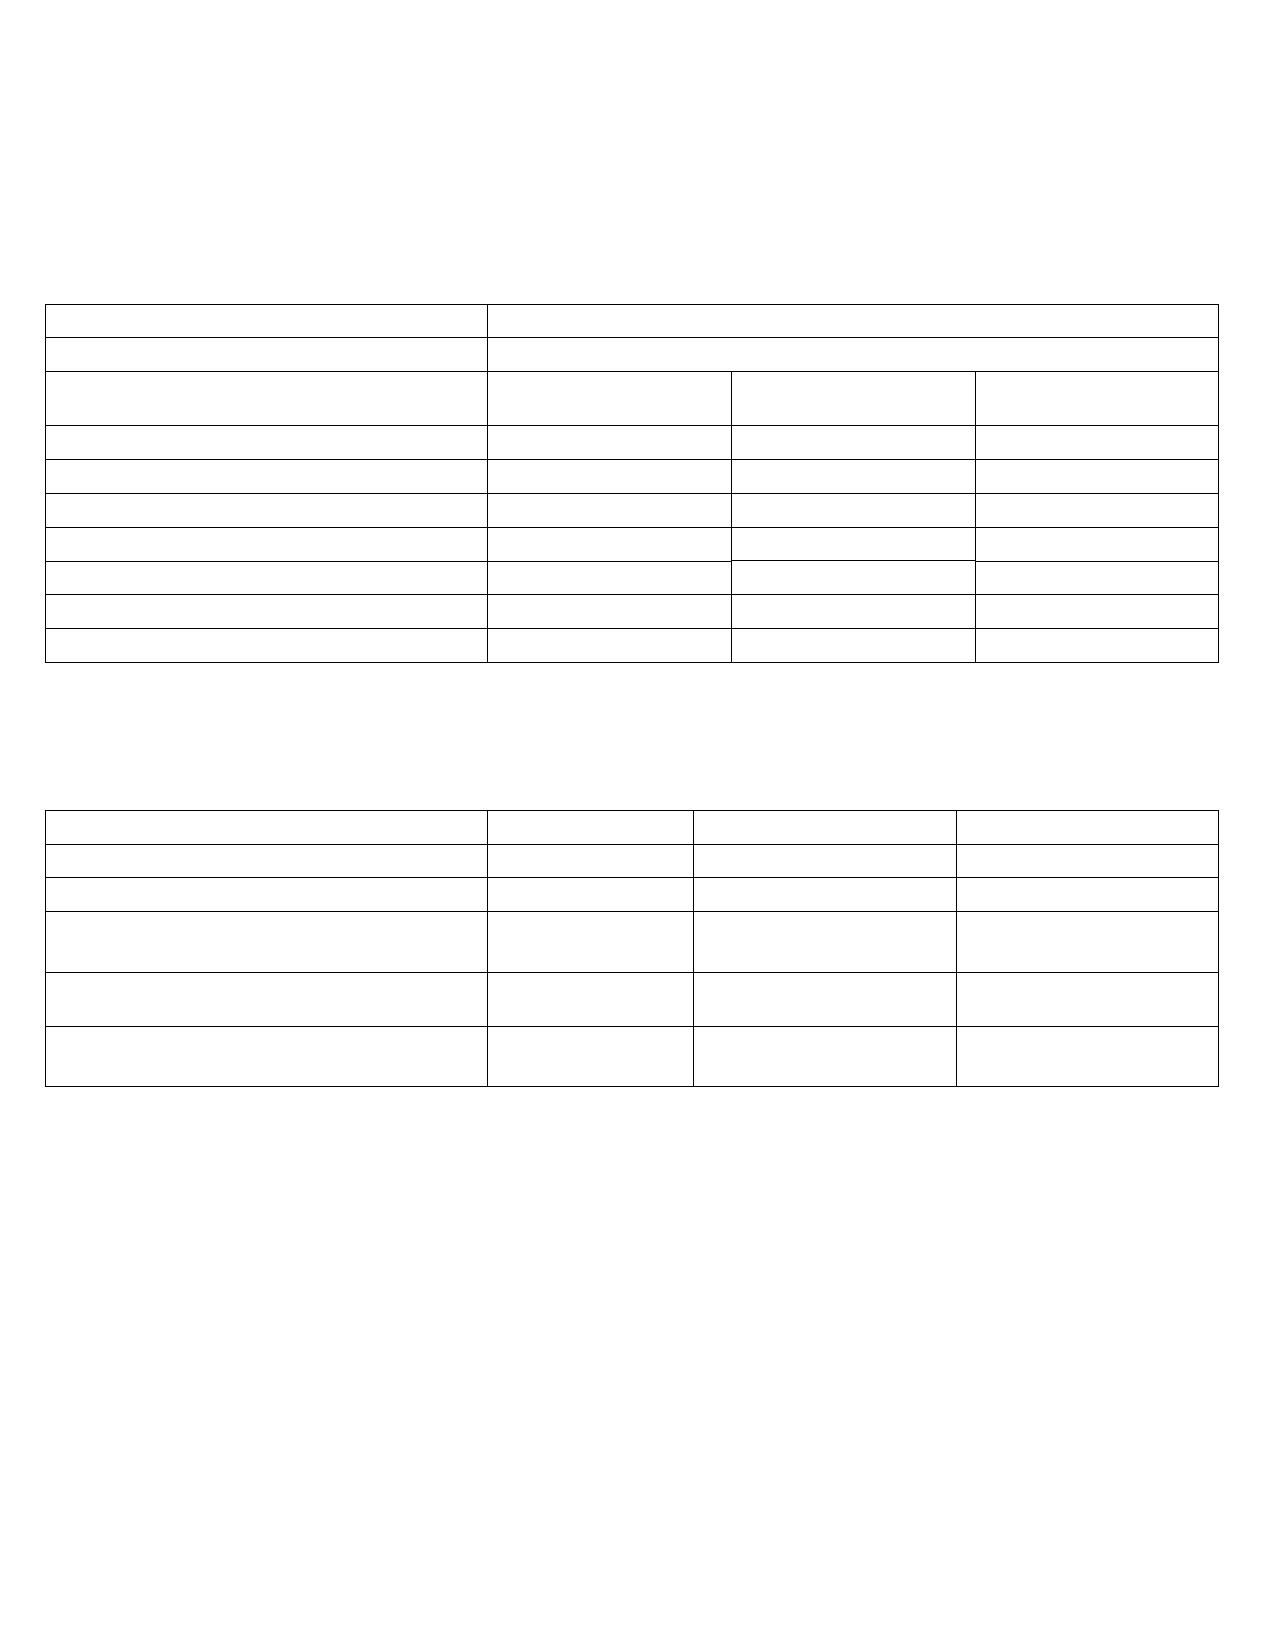 MR2401 데이터시트 및 MR2401 PDF